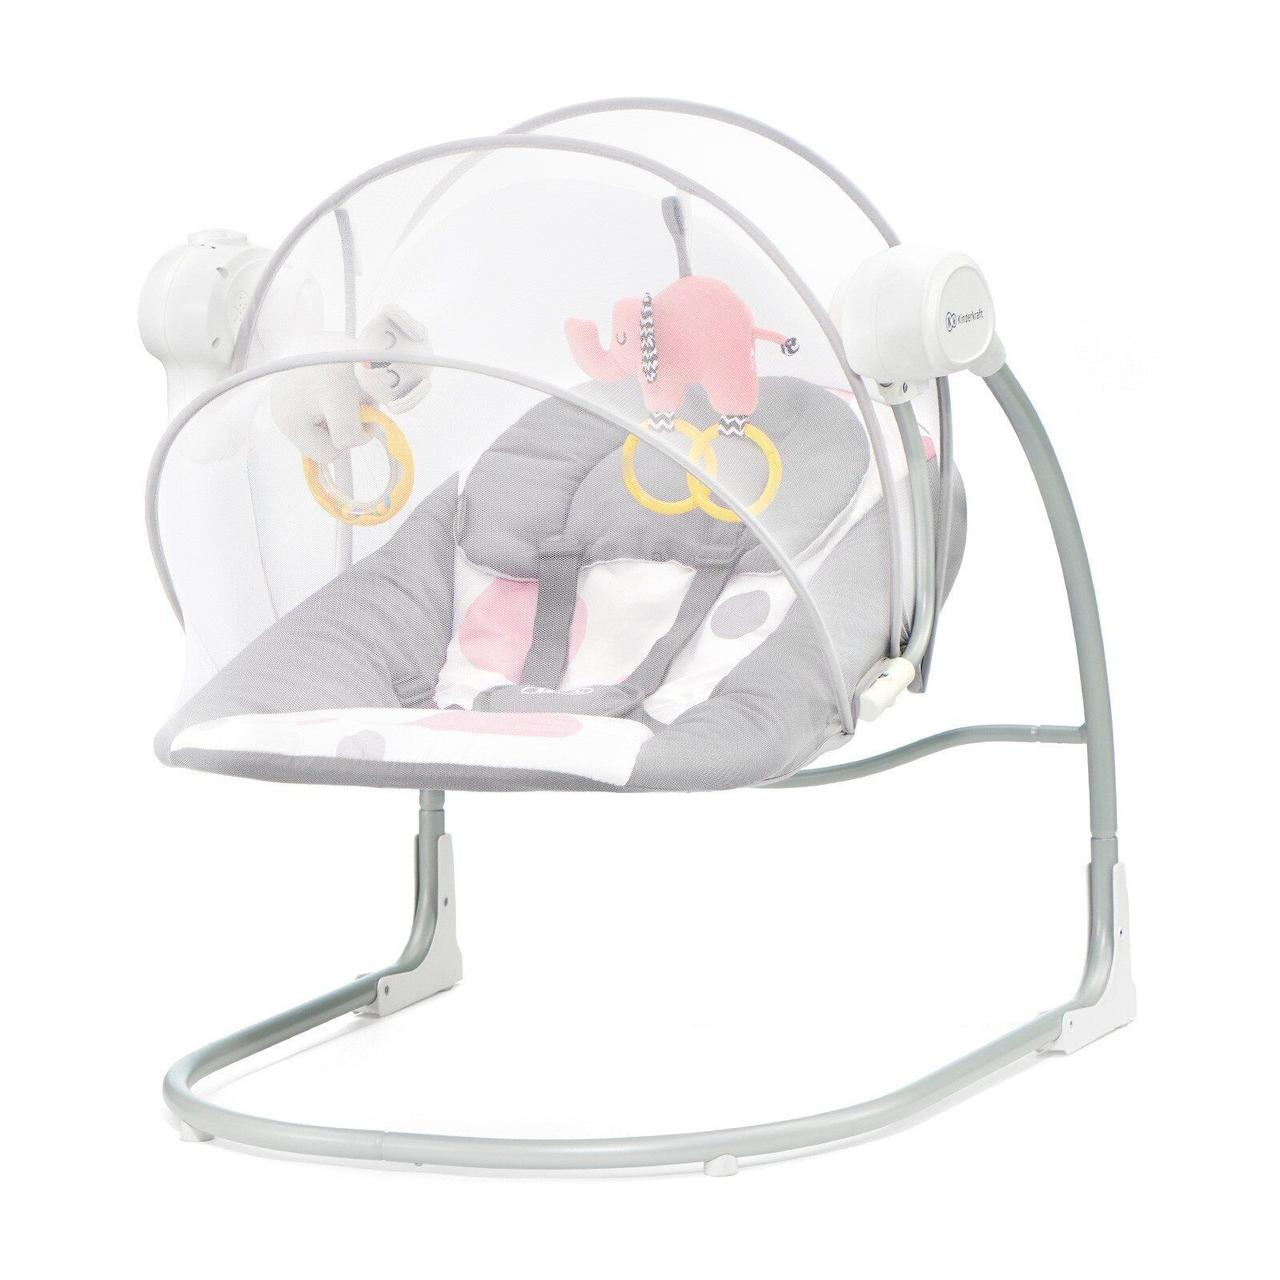 Кресло-качалка Kinderkraft Minky Pink 8 мелодий ВИДЕО ОБЗОР